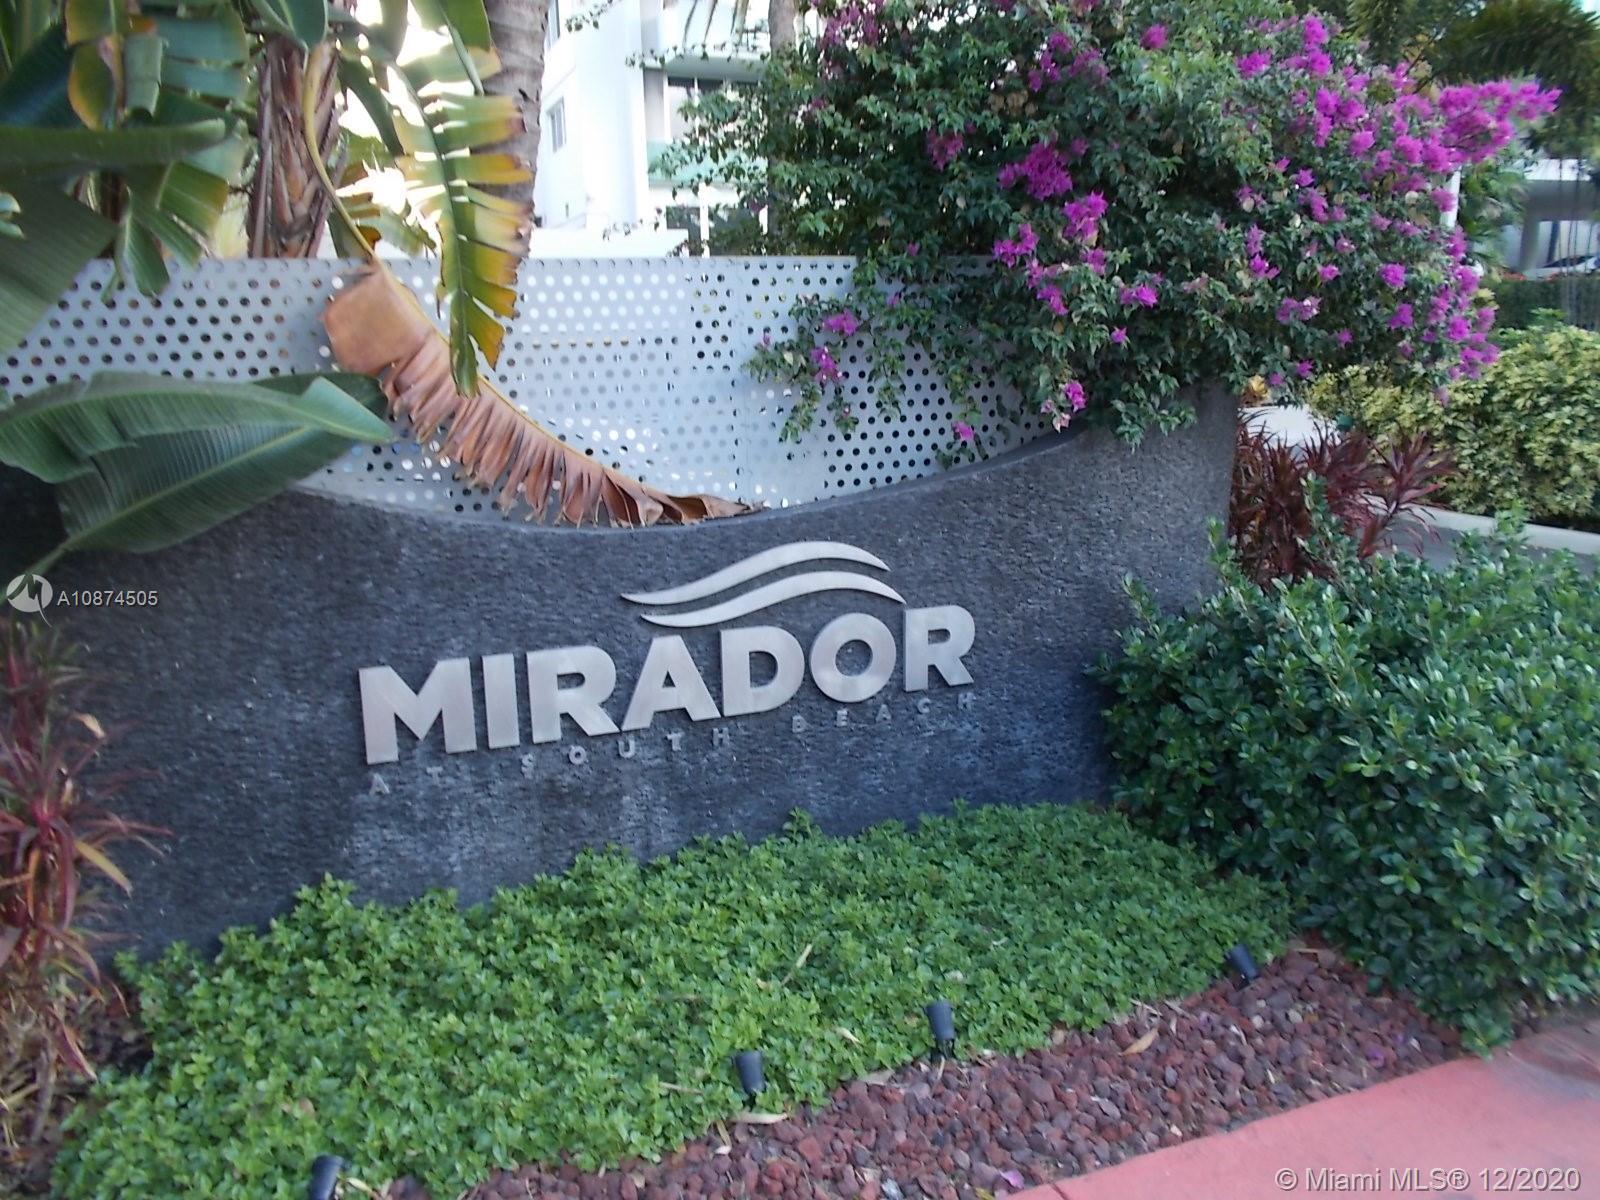 Mirador North #203 - 1200 West Ave #203, Miami Beach, FL 33139